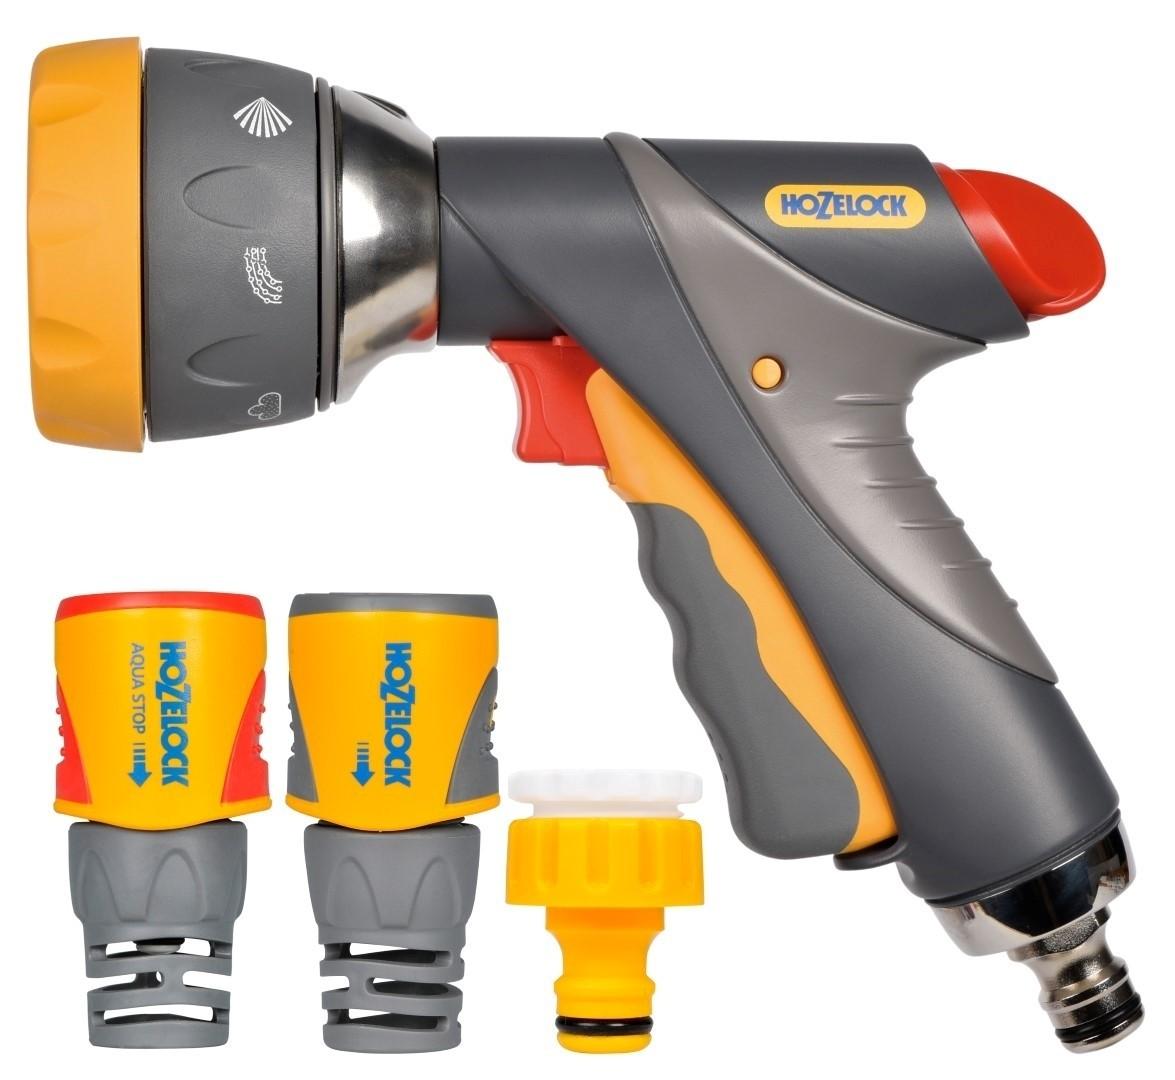 Multi-spray pro startset doorsnede 12,5 en 15 mm